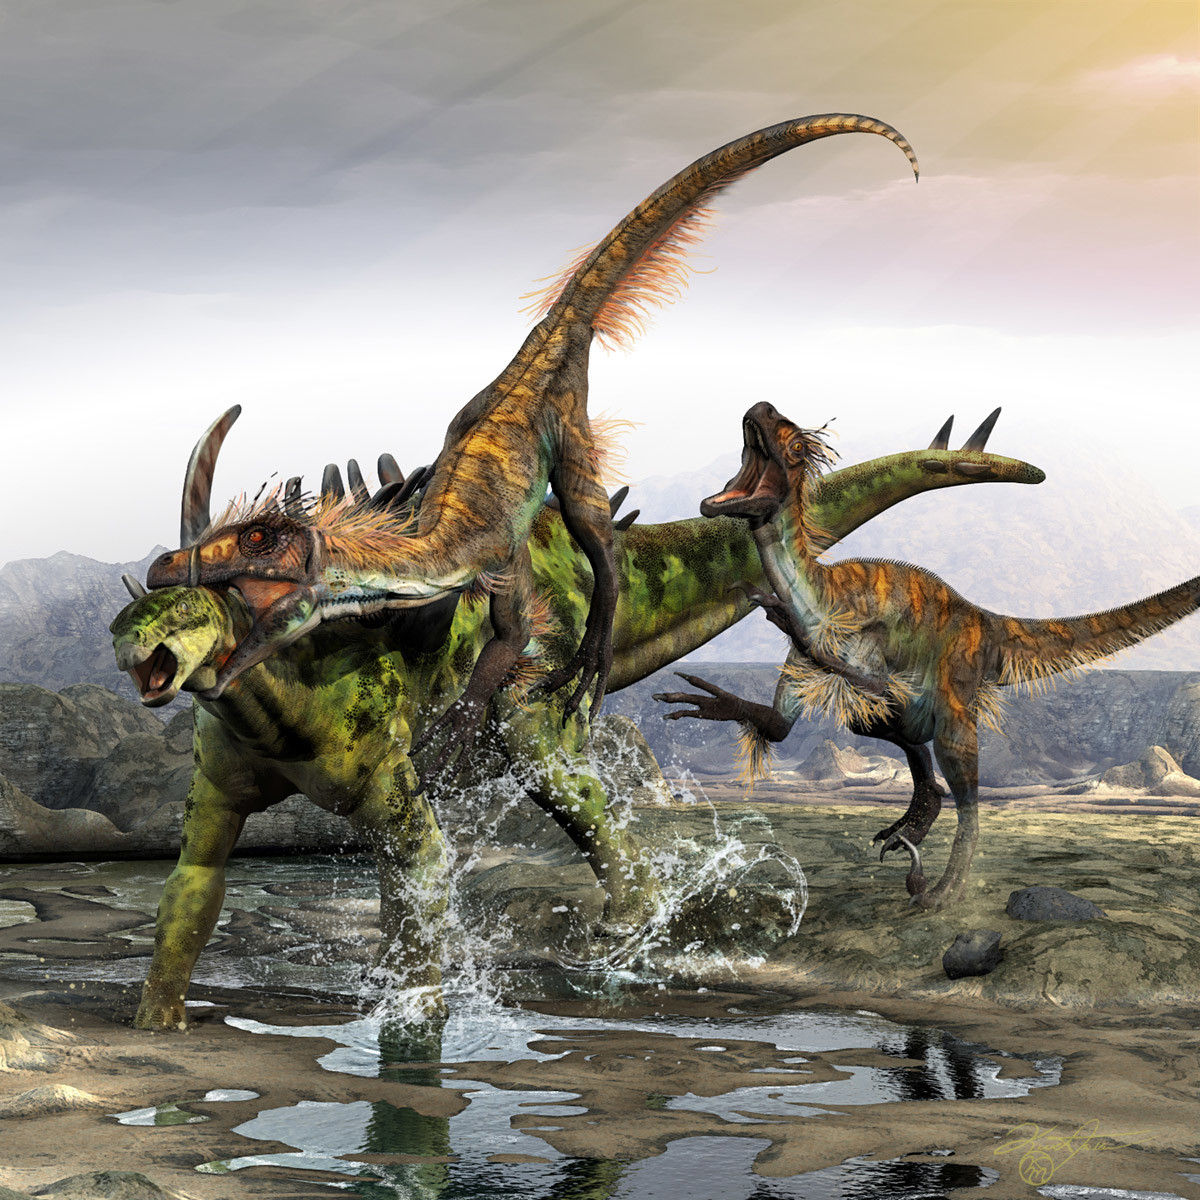 Kurt miller through the armor of gigantspinosaurus